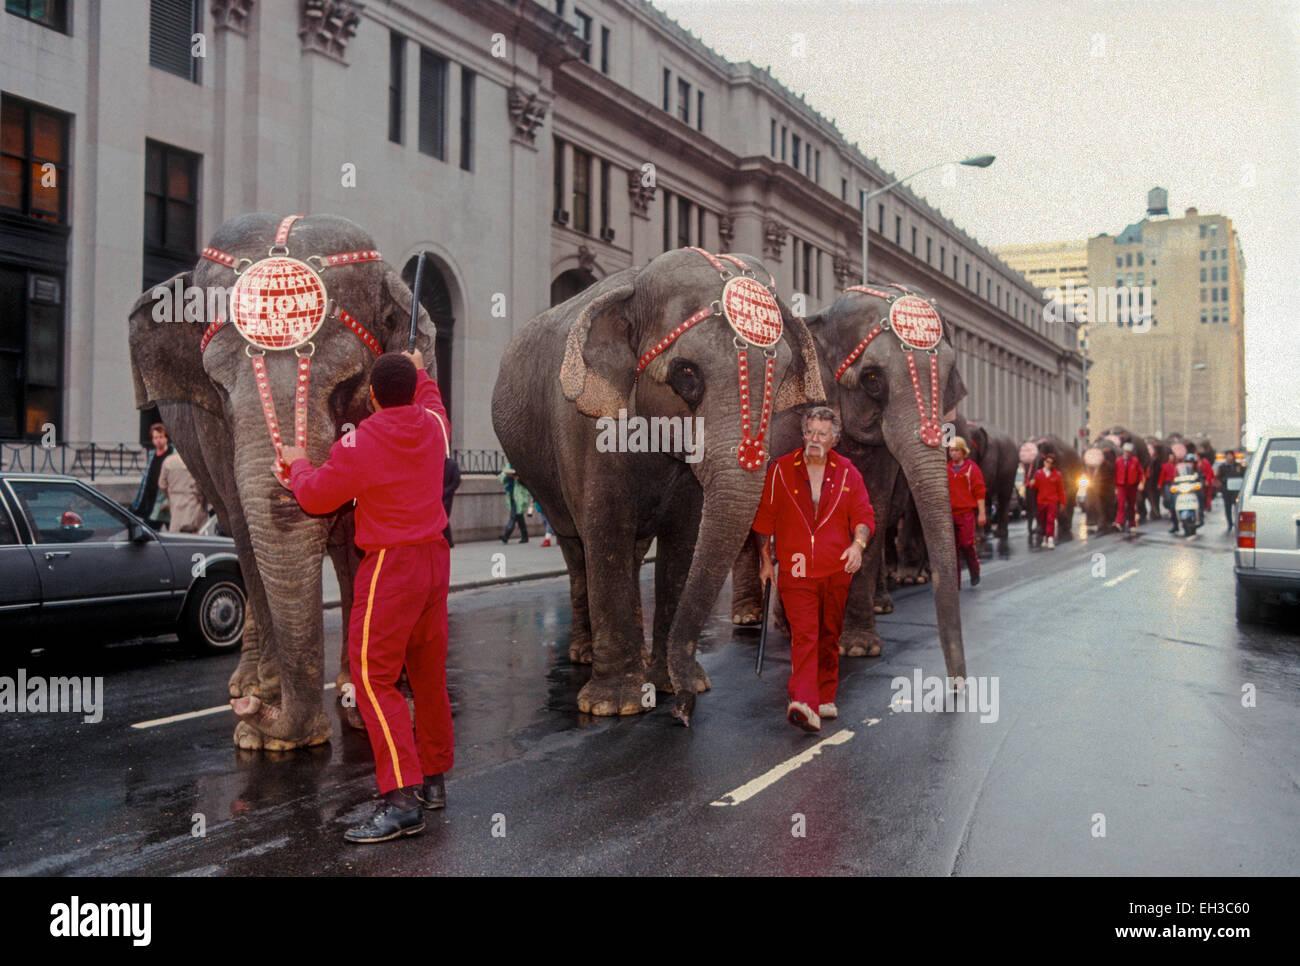 Ringling Brothers Barnum and Bailey Circus Parade through Midtown Manhattan - Stock Image